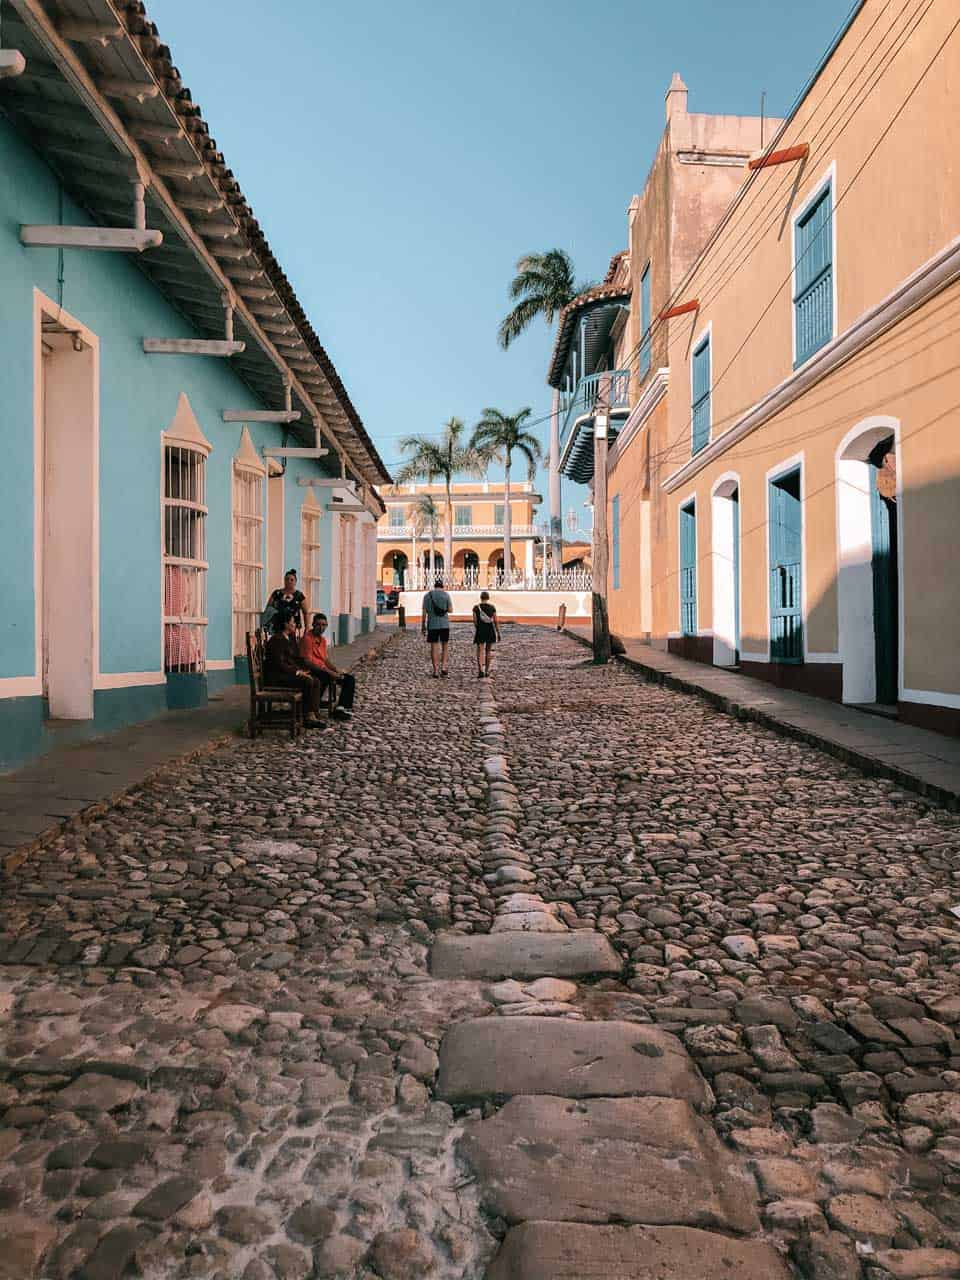 trinidad rue pavee cuba autrement 2